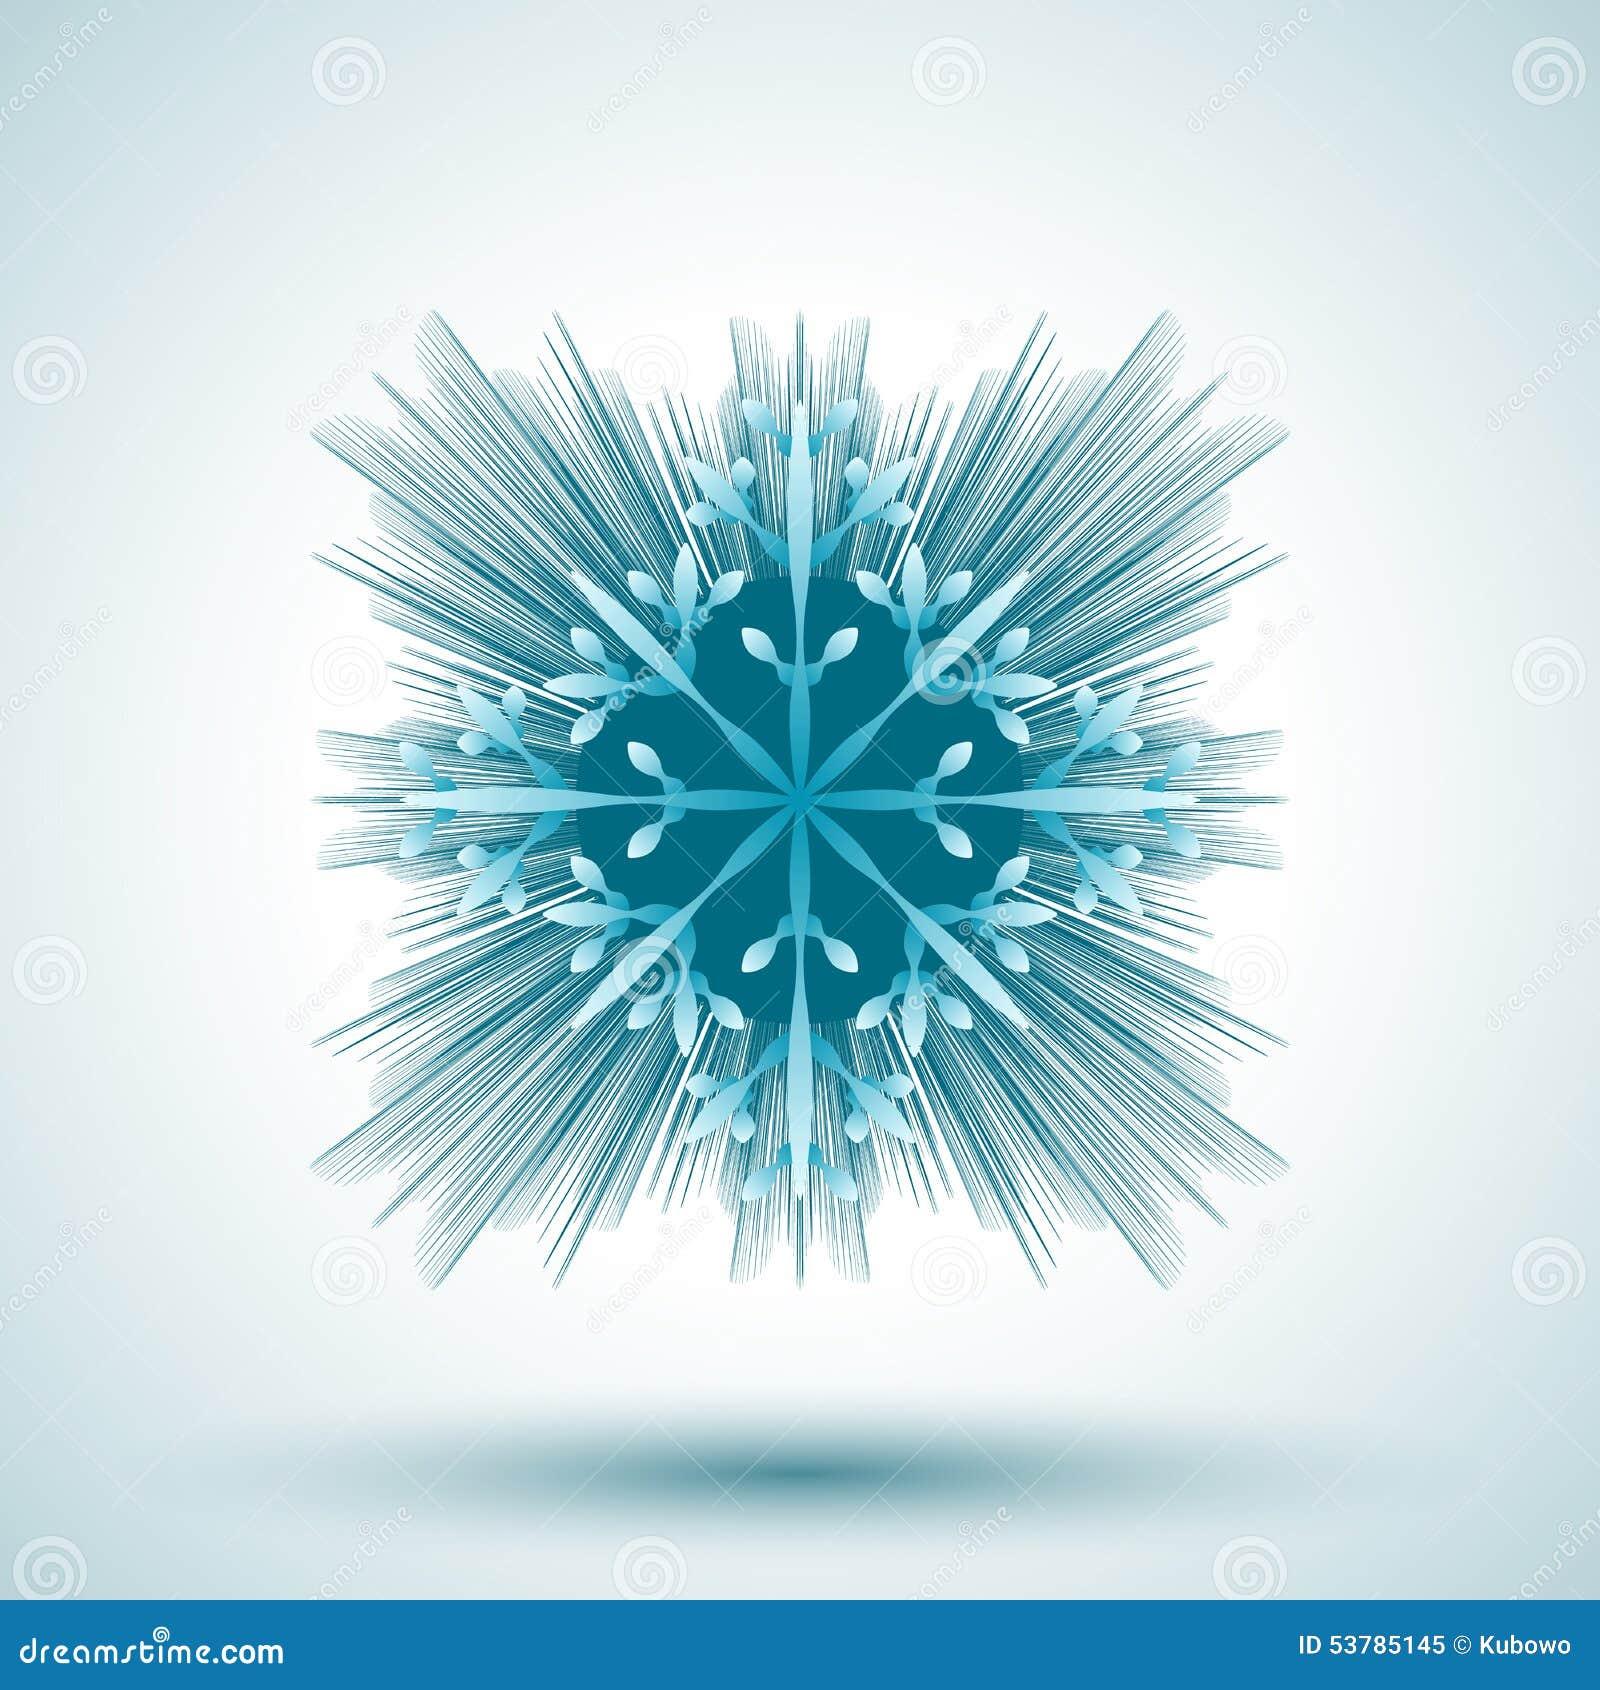 Płatek śniegu abstrakcyjne